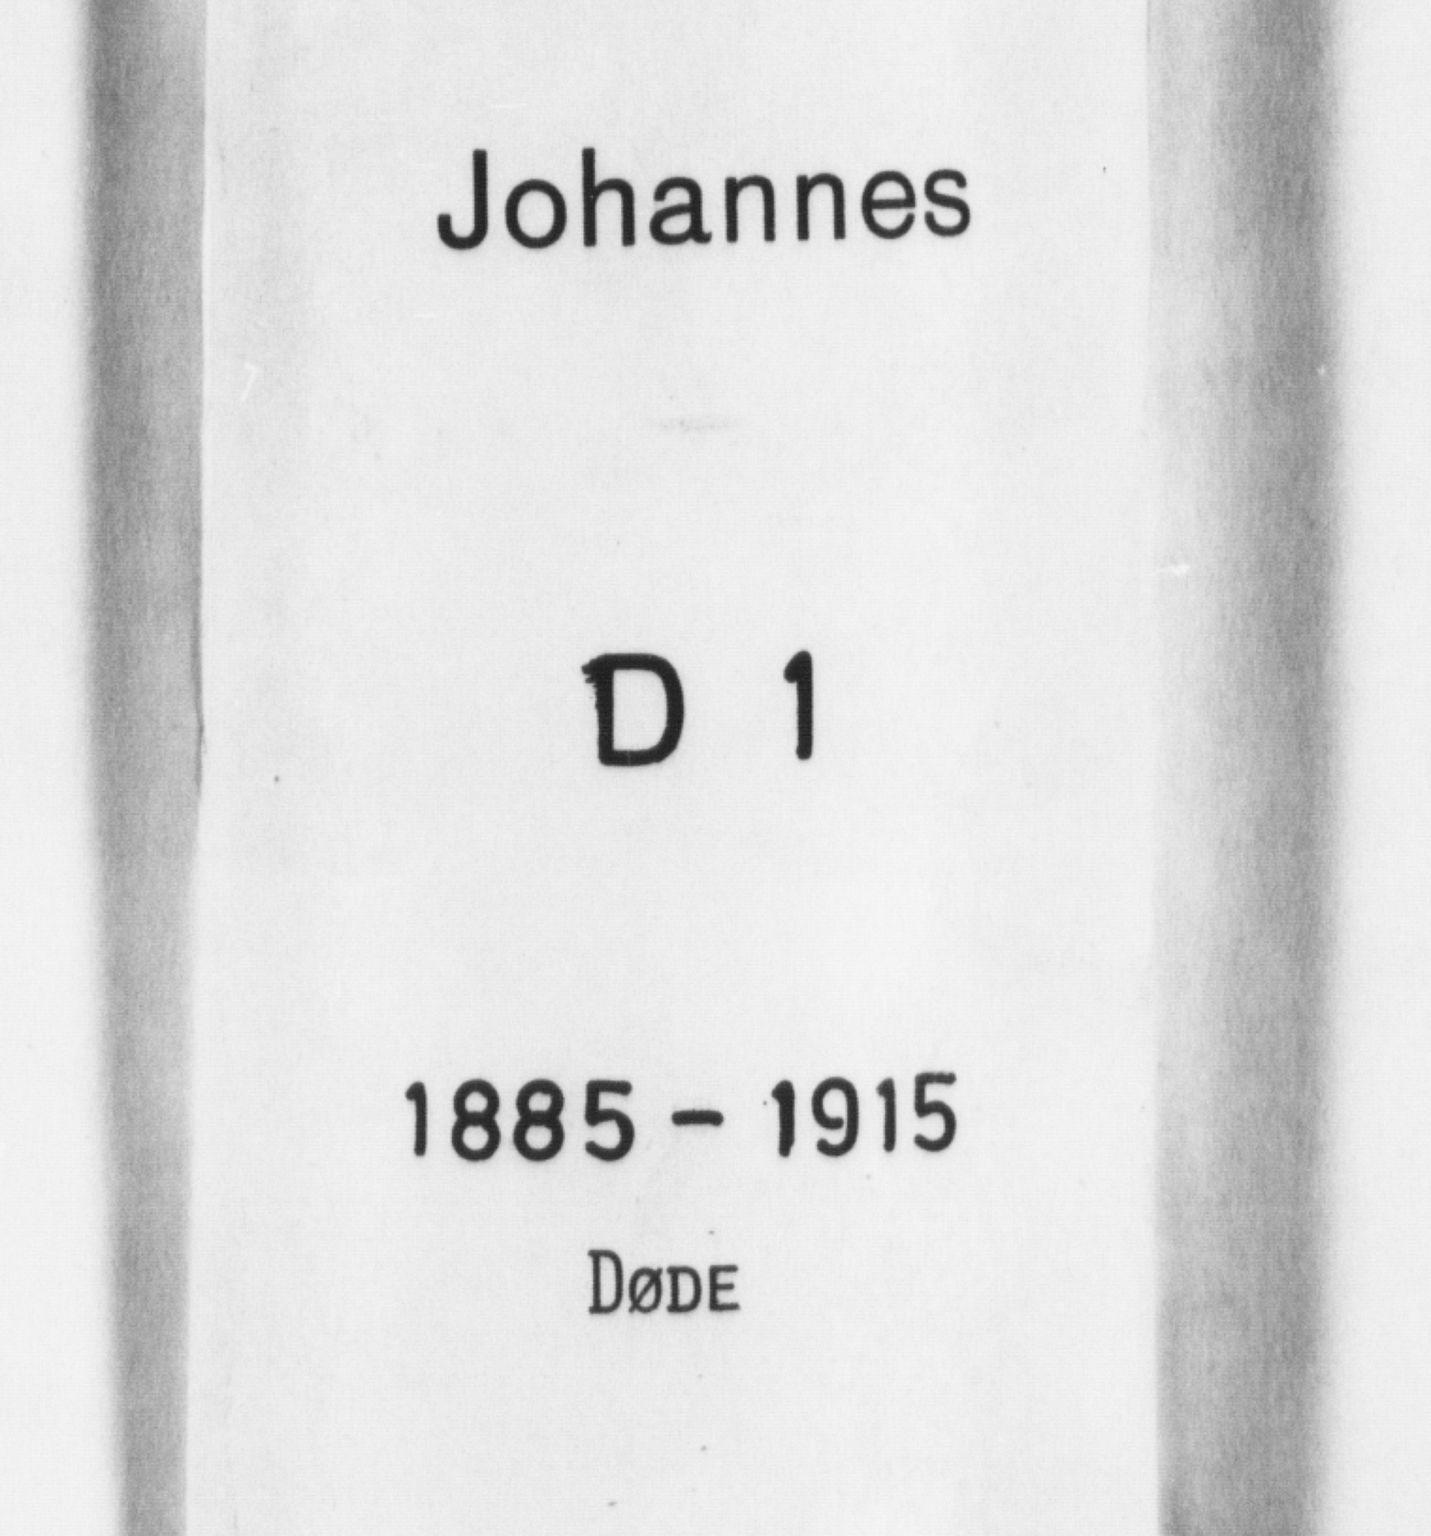 SAB, Johanneskirken Sokneprestembete, H/Hab: Parish register (copy) no. D 1, 1885-1915